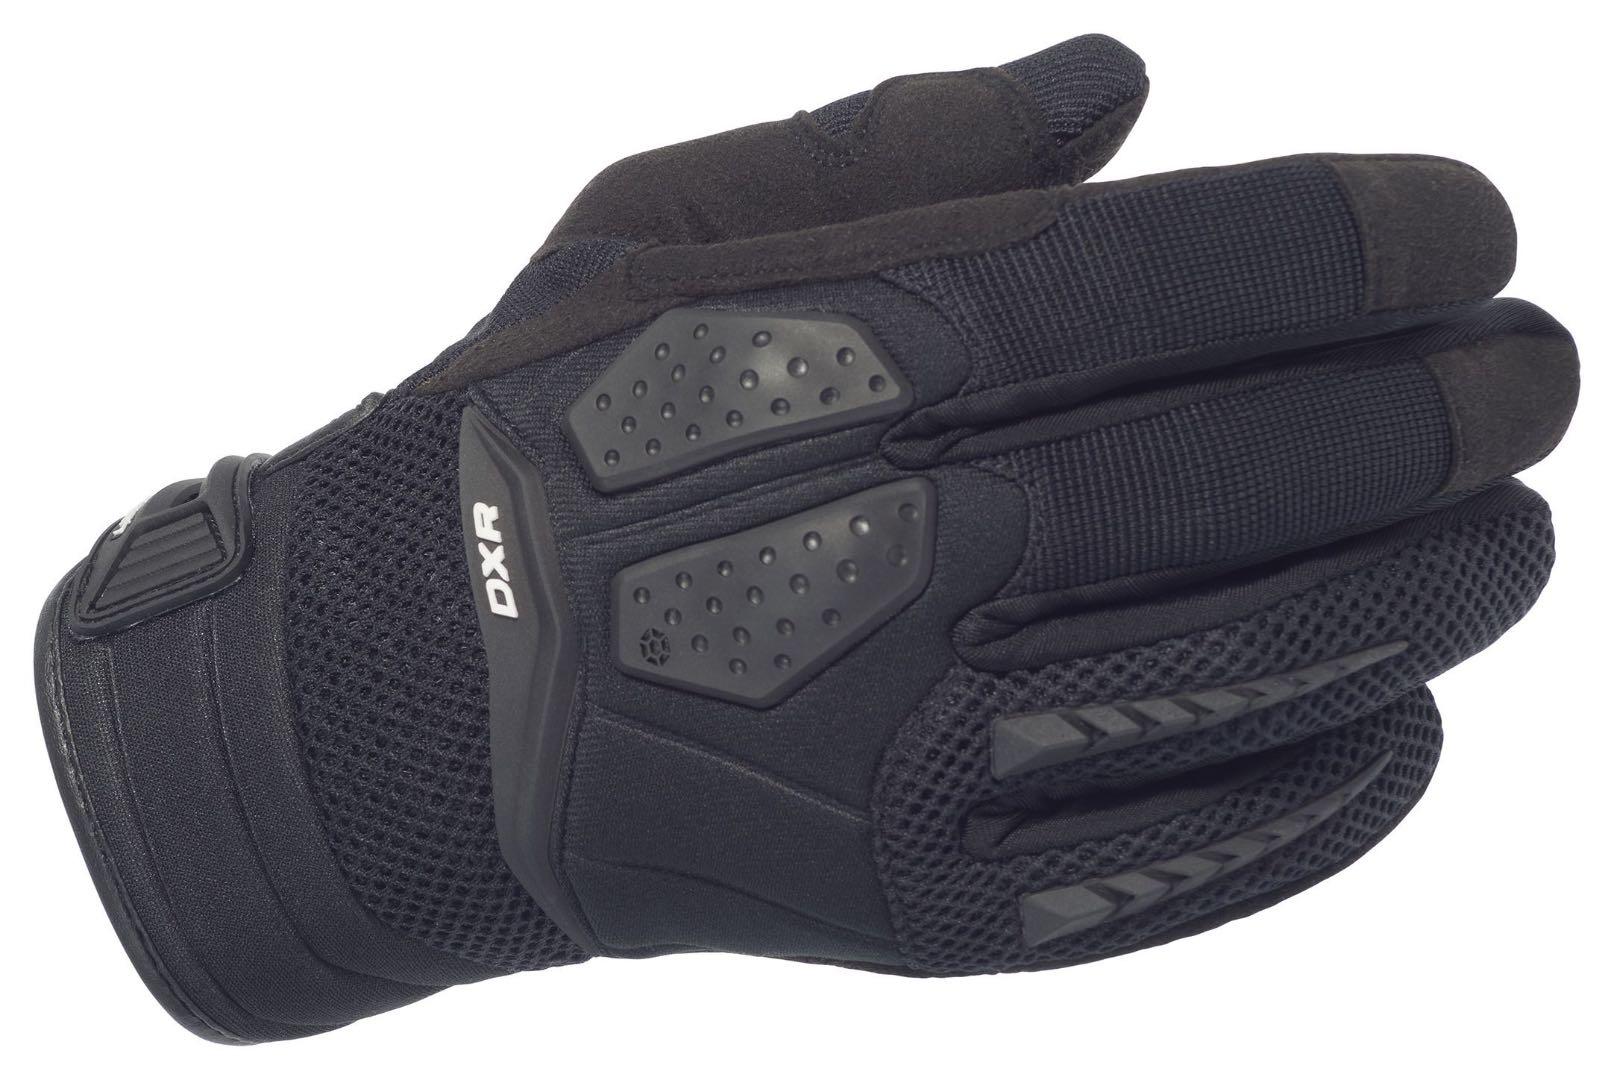 Cortech motorcycle gloves DXR